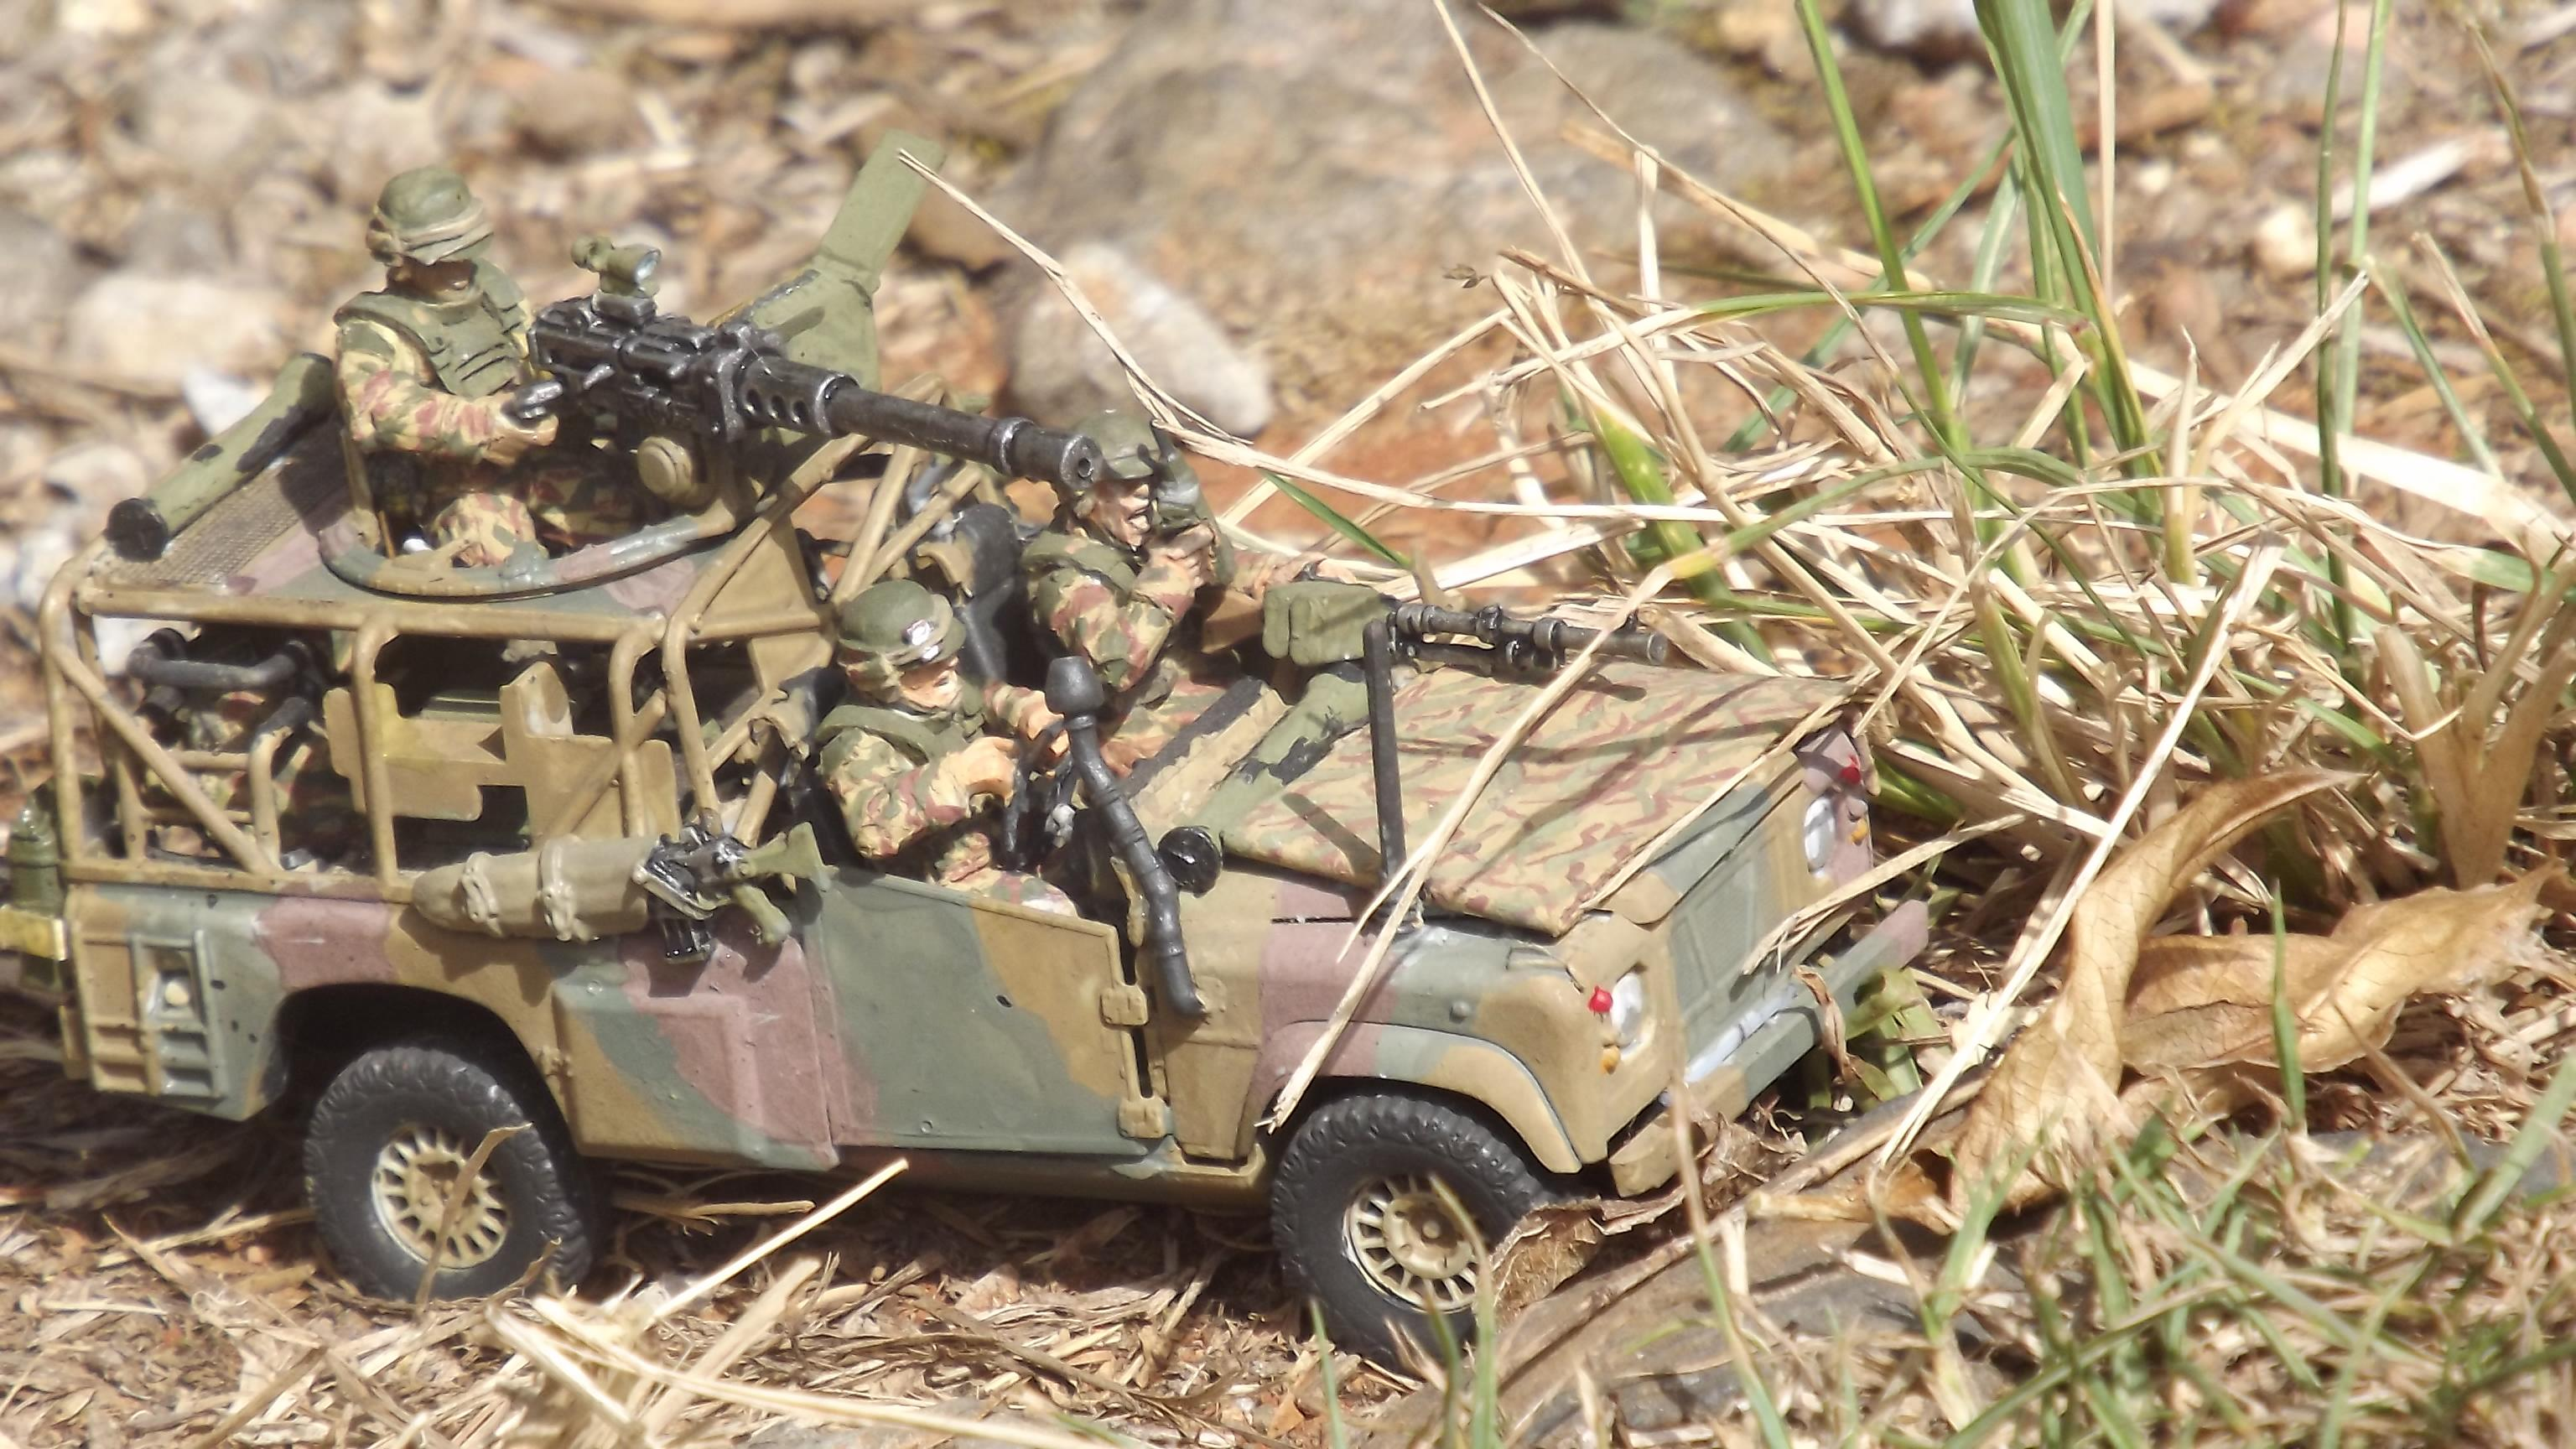 1/48th Scale, Airfix, Landrover Defender, Light Vehicle, Recon, Scout Vehicle, Wmik